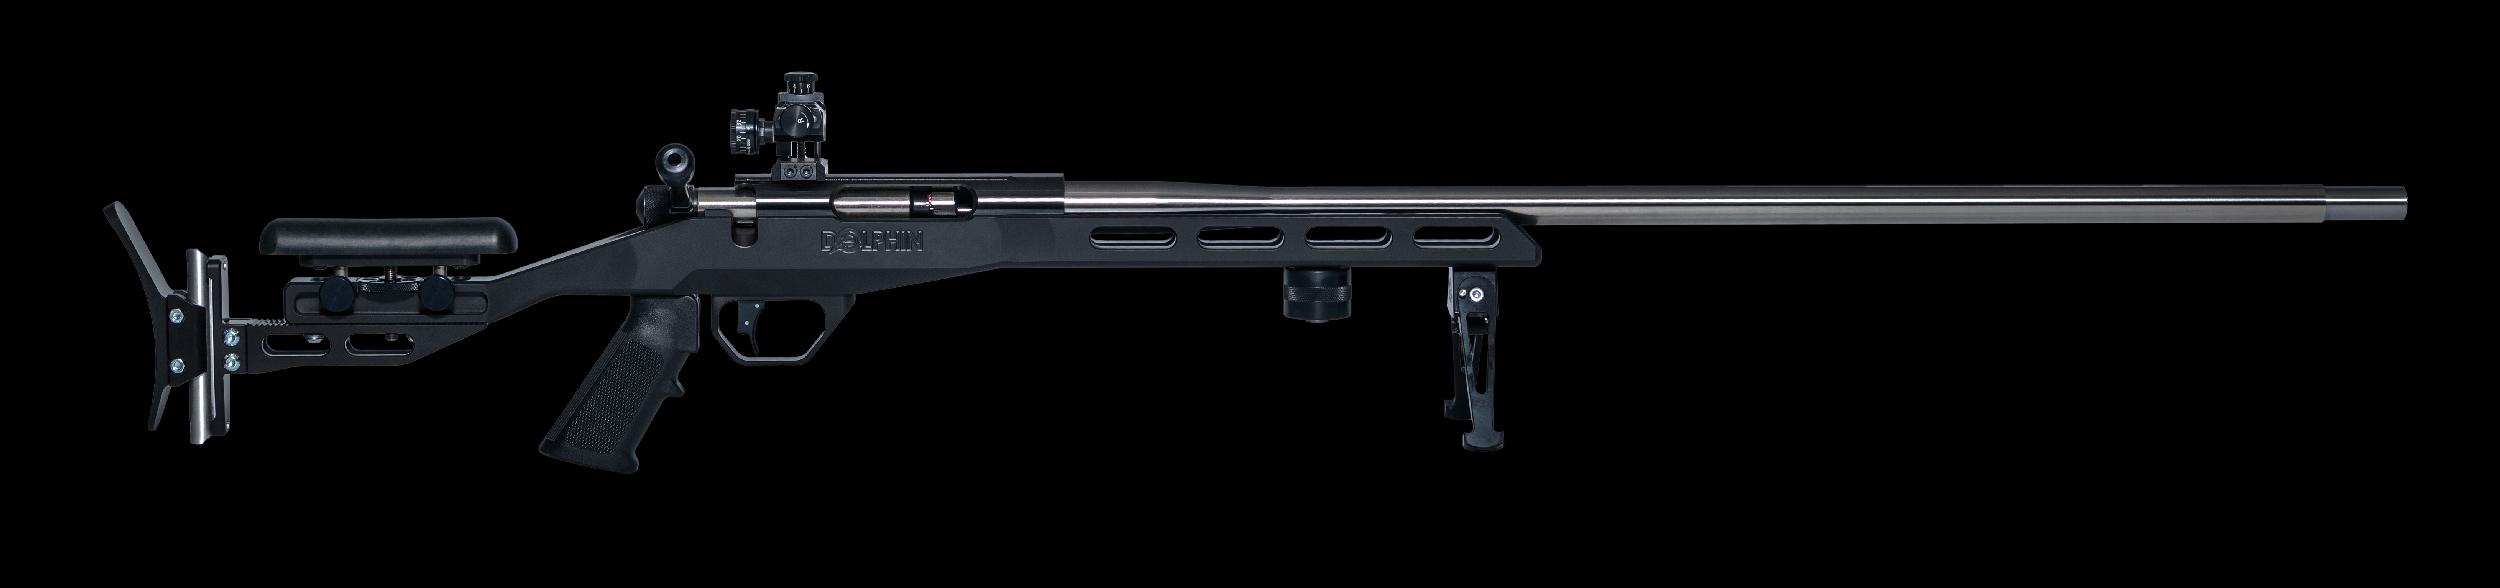 target-rifle-black-bg-new